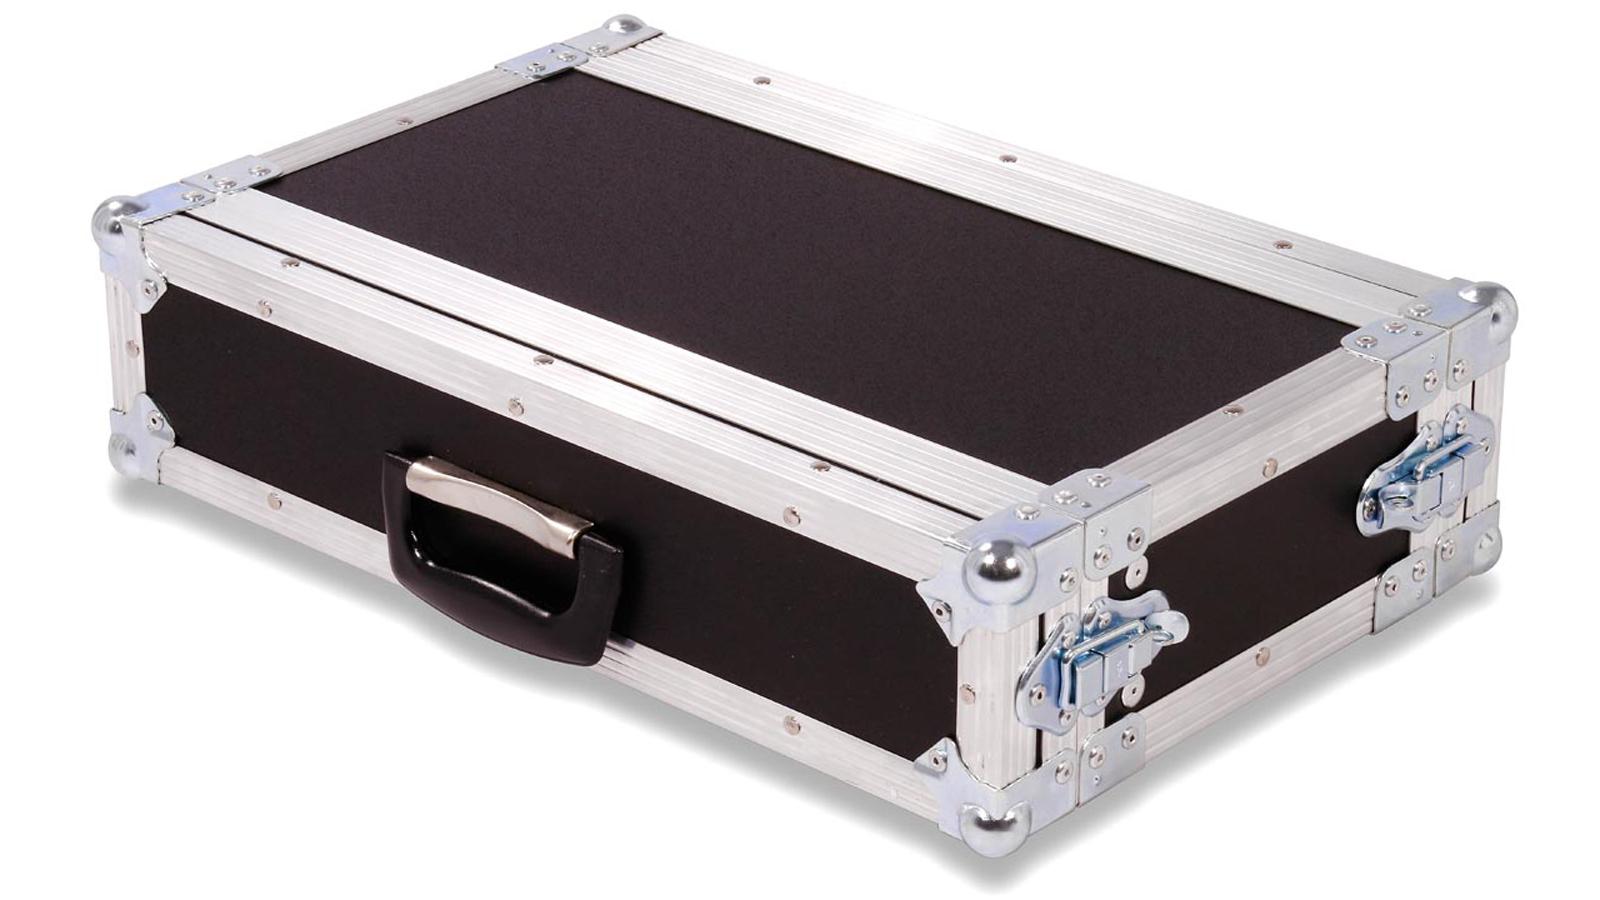 LT-Case 2 HE ECO II WK compact Rack 23 cm 6370